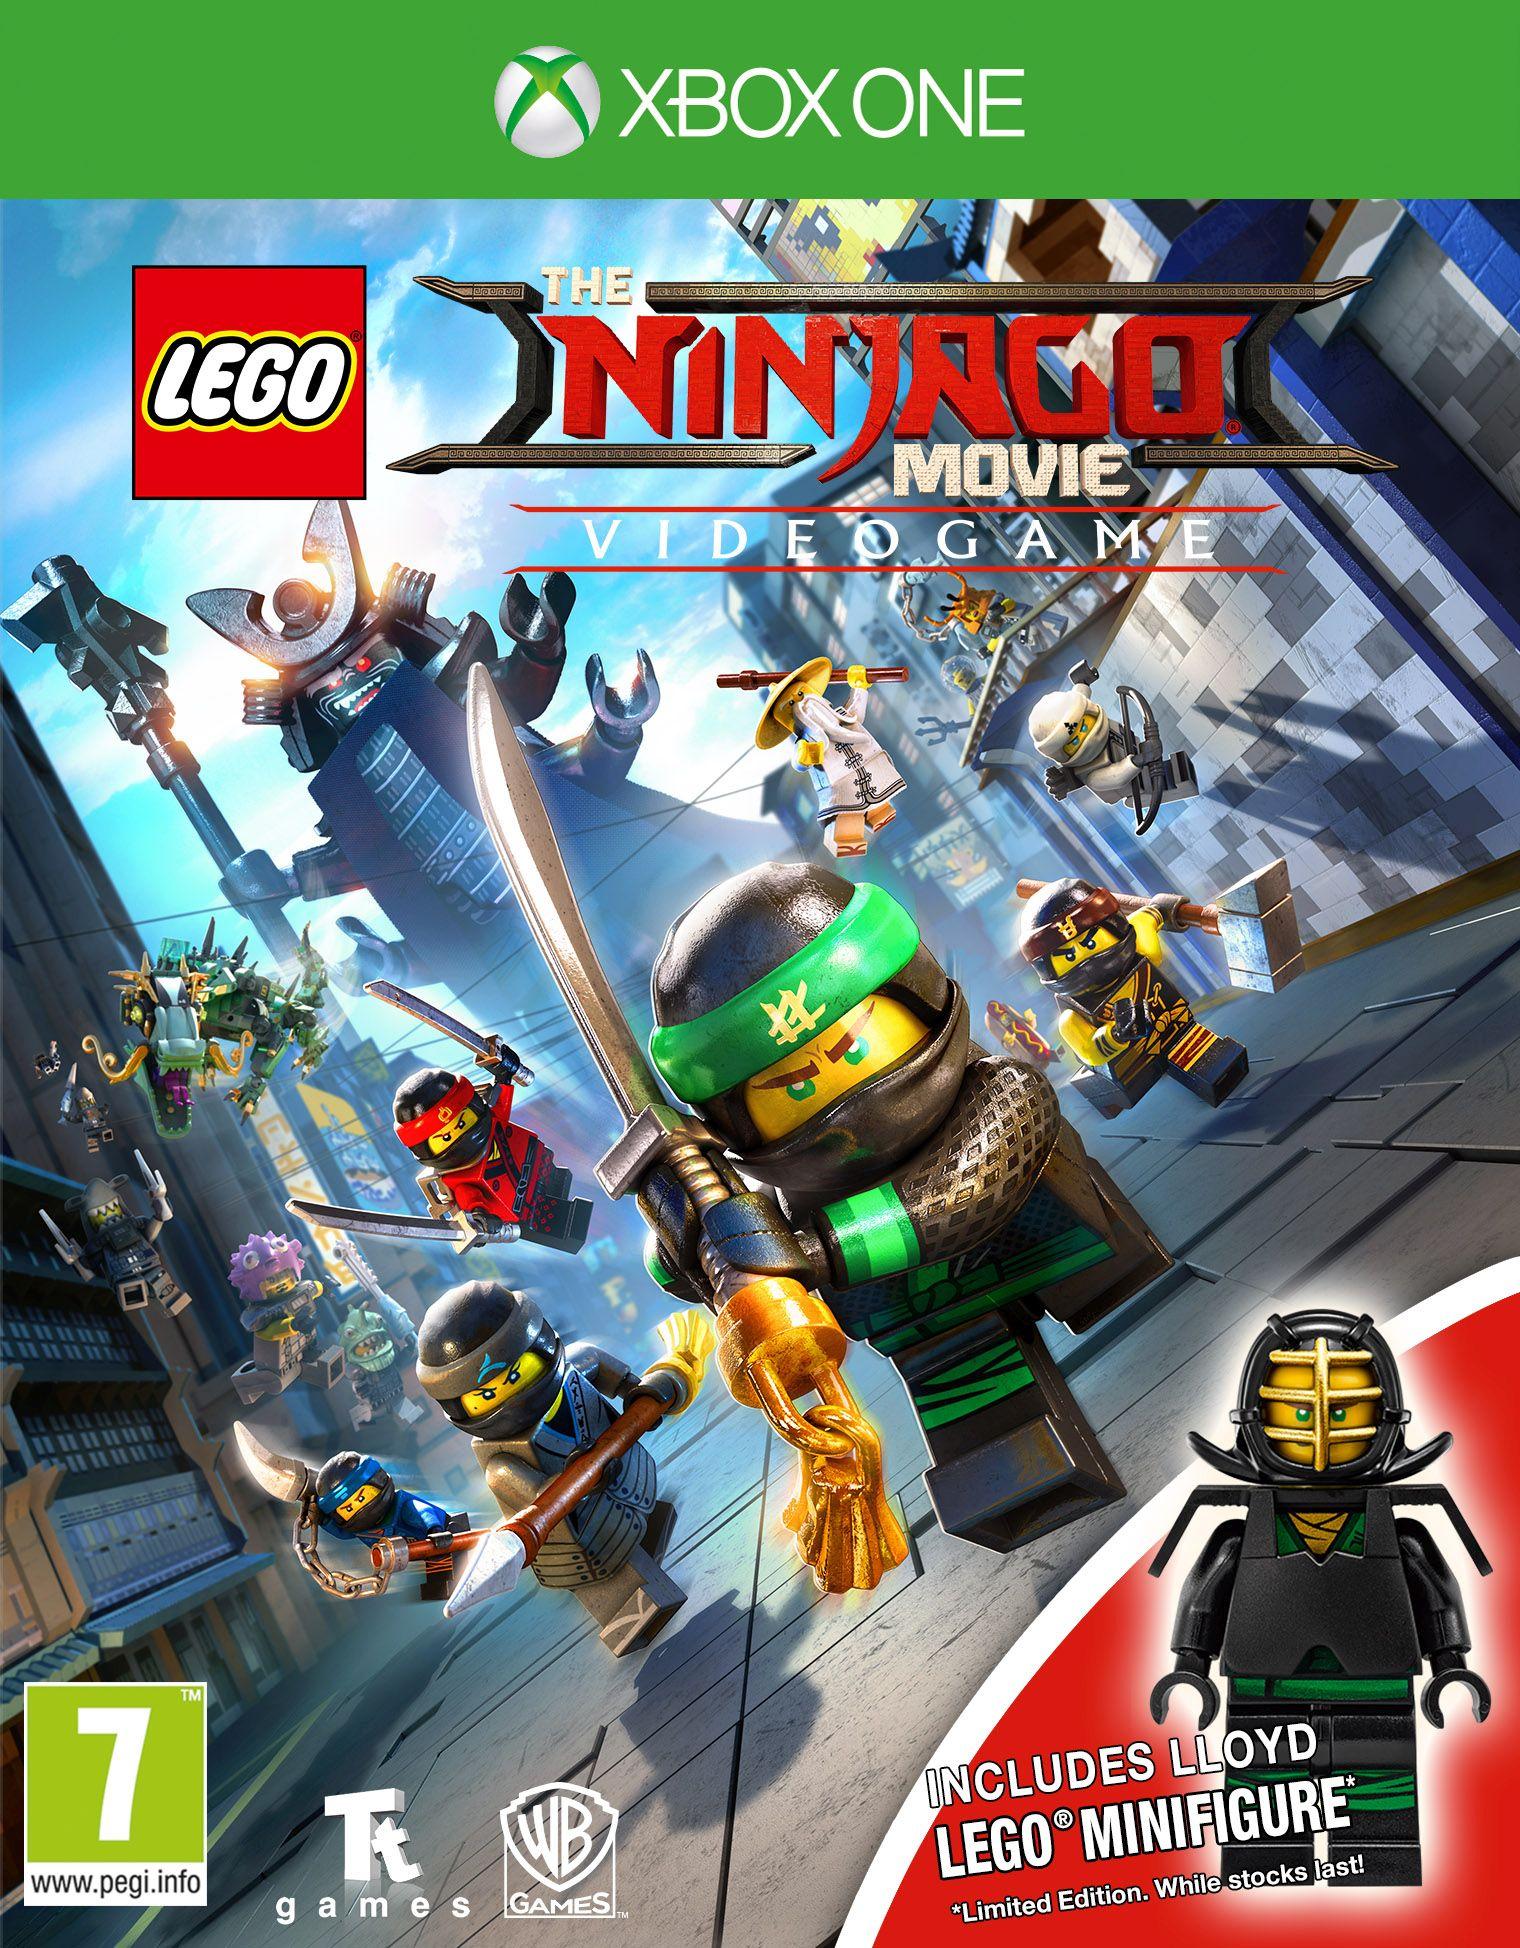 LEGO Ninjago Movie - Gra wideo + minifigurka LLOYD LEGO(XOne) PL - Polski Dubbing + Czapka